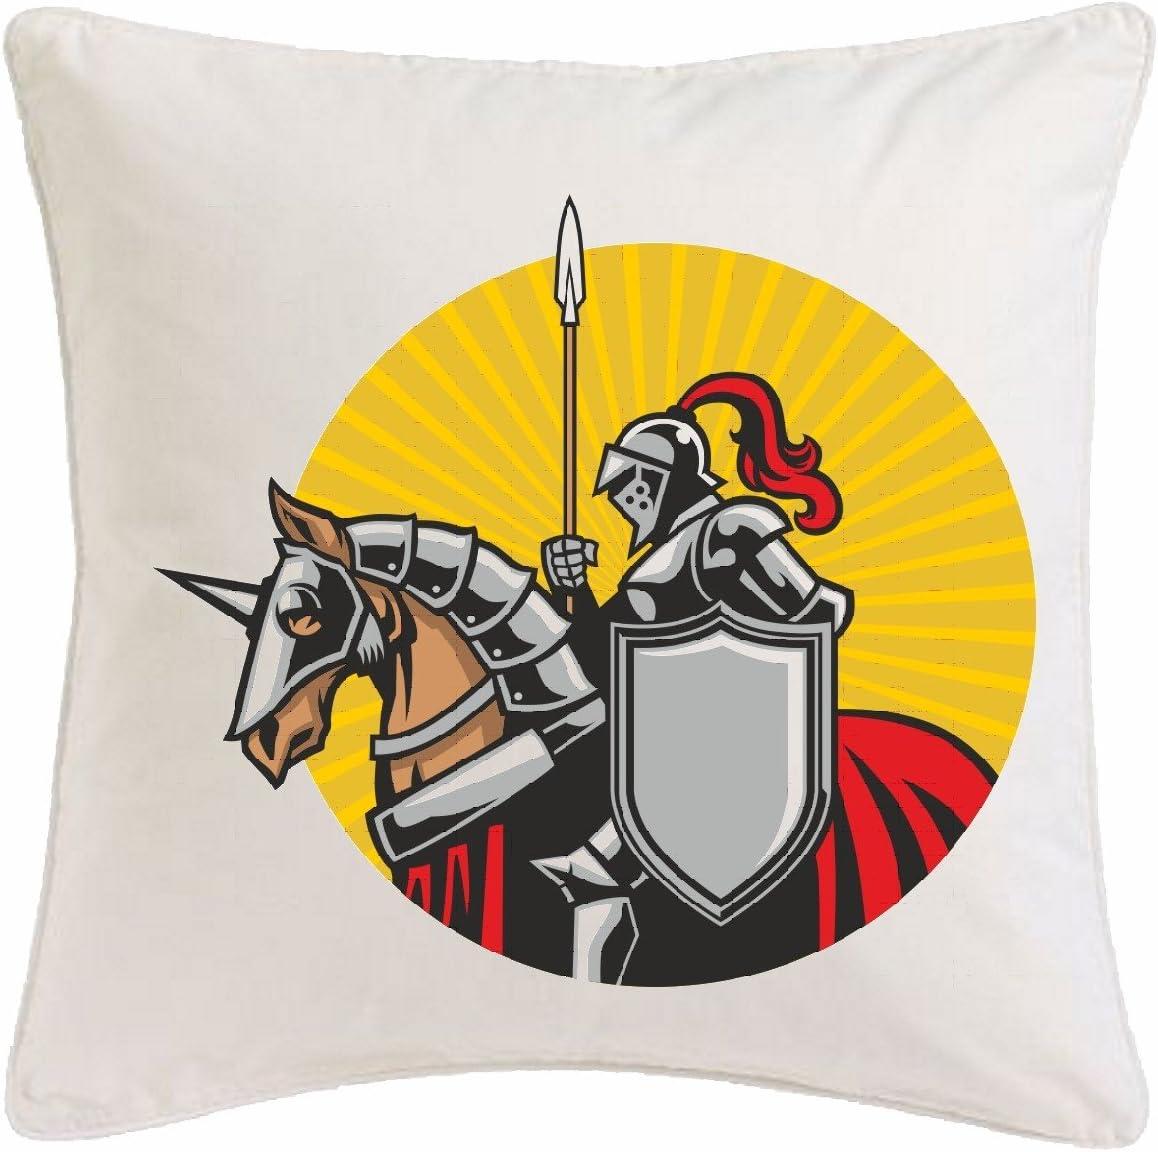 Reifen-Markt Funda de Almohada 40x40cm Logotipo del Caballero con EL Caballo KNIGHTSWORD Knight Knight Armour Ritterburg Casco Protector Microfibra en Color Blanco